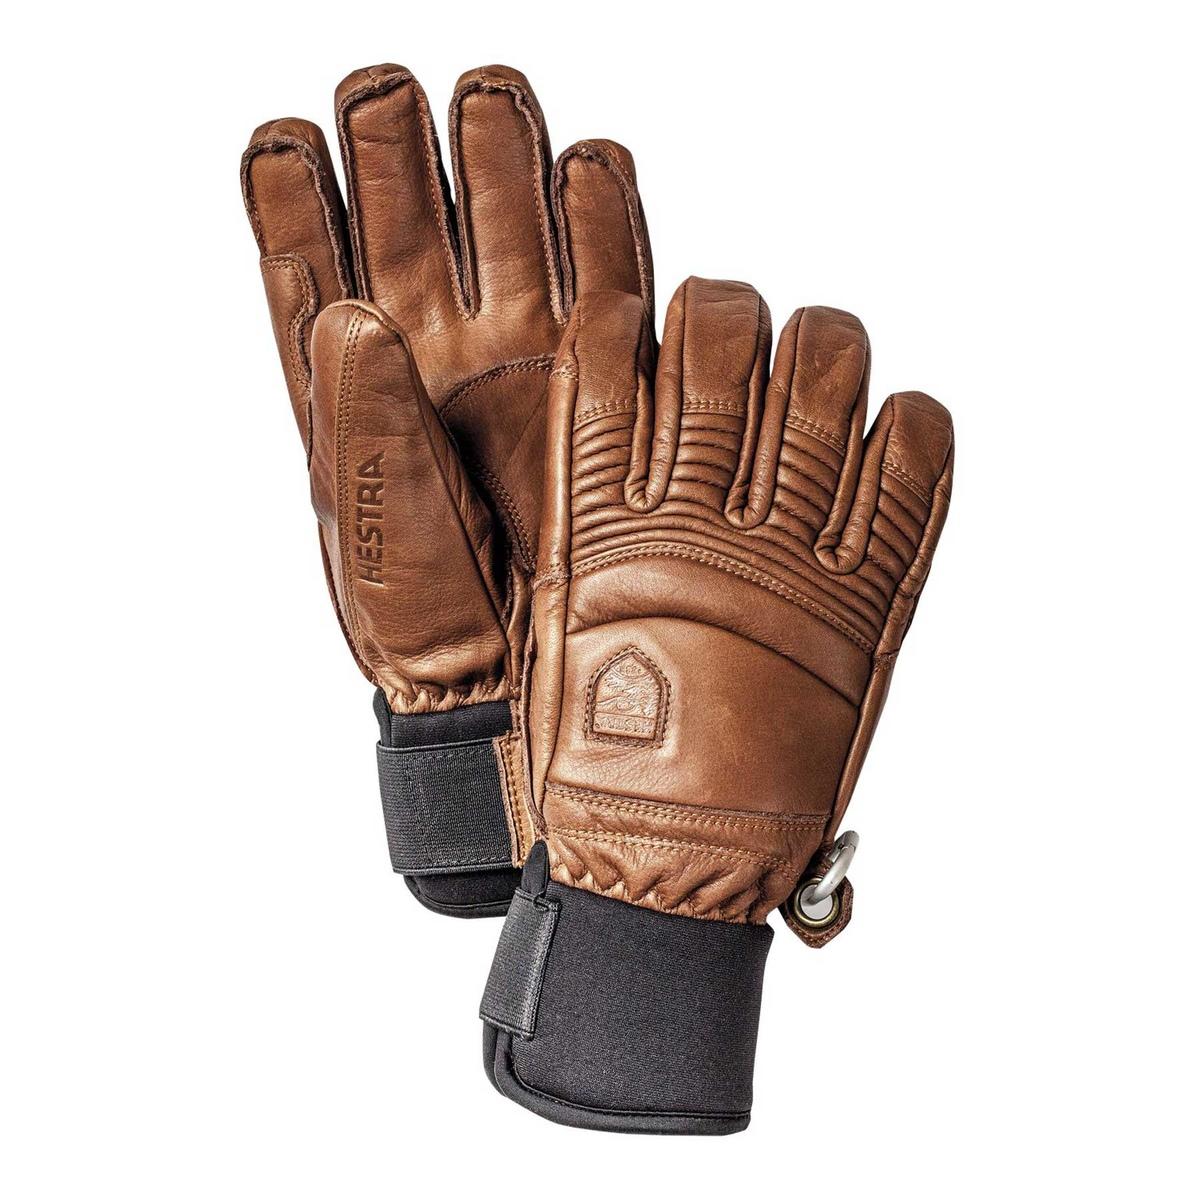 Prezzi Hestra Guanti Leather fall line